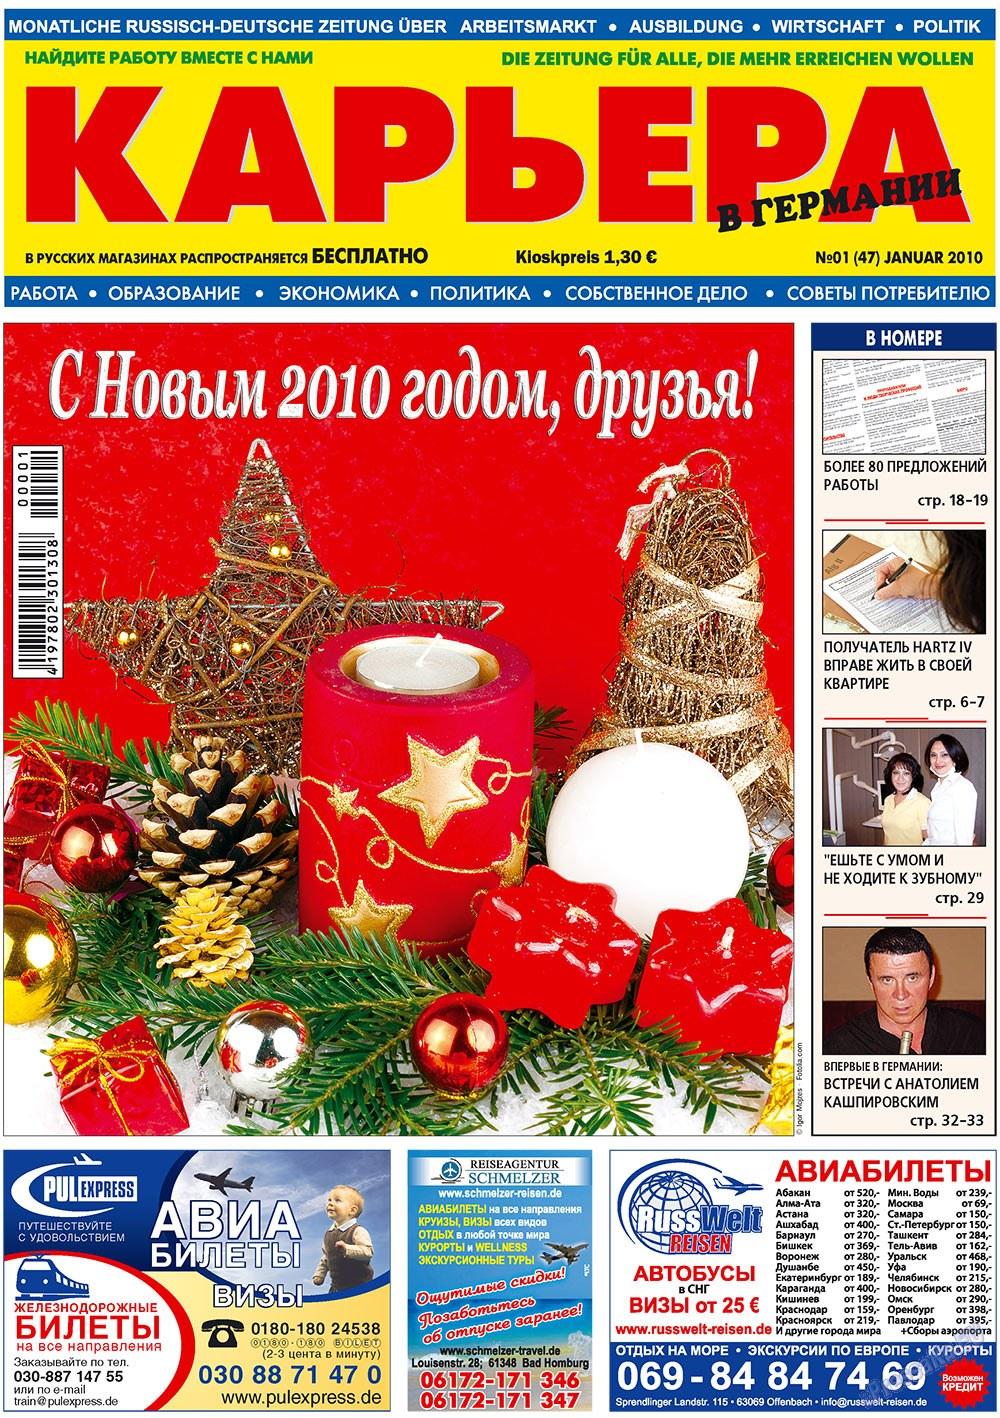 Карьера (газета). 2010 год, номер 1, стр. 1